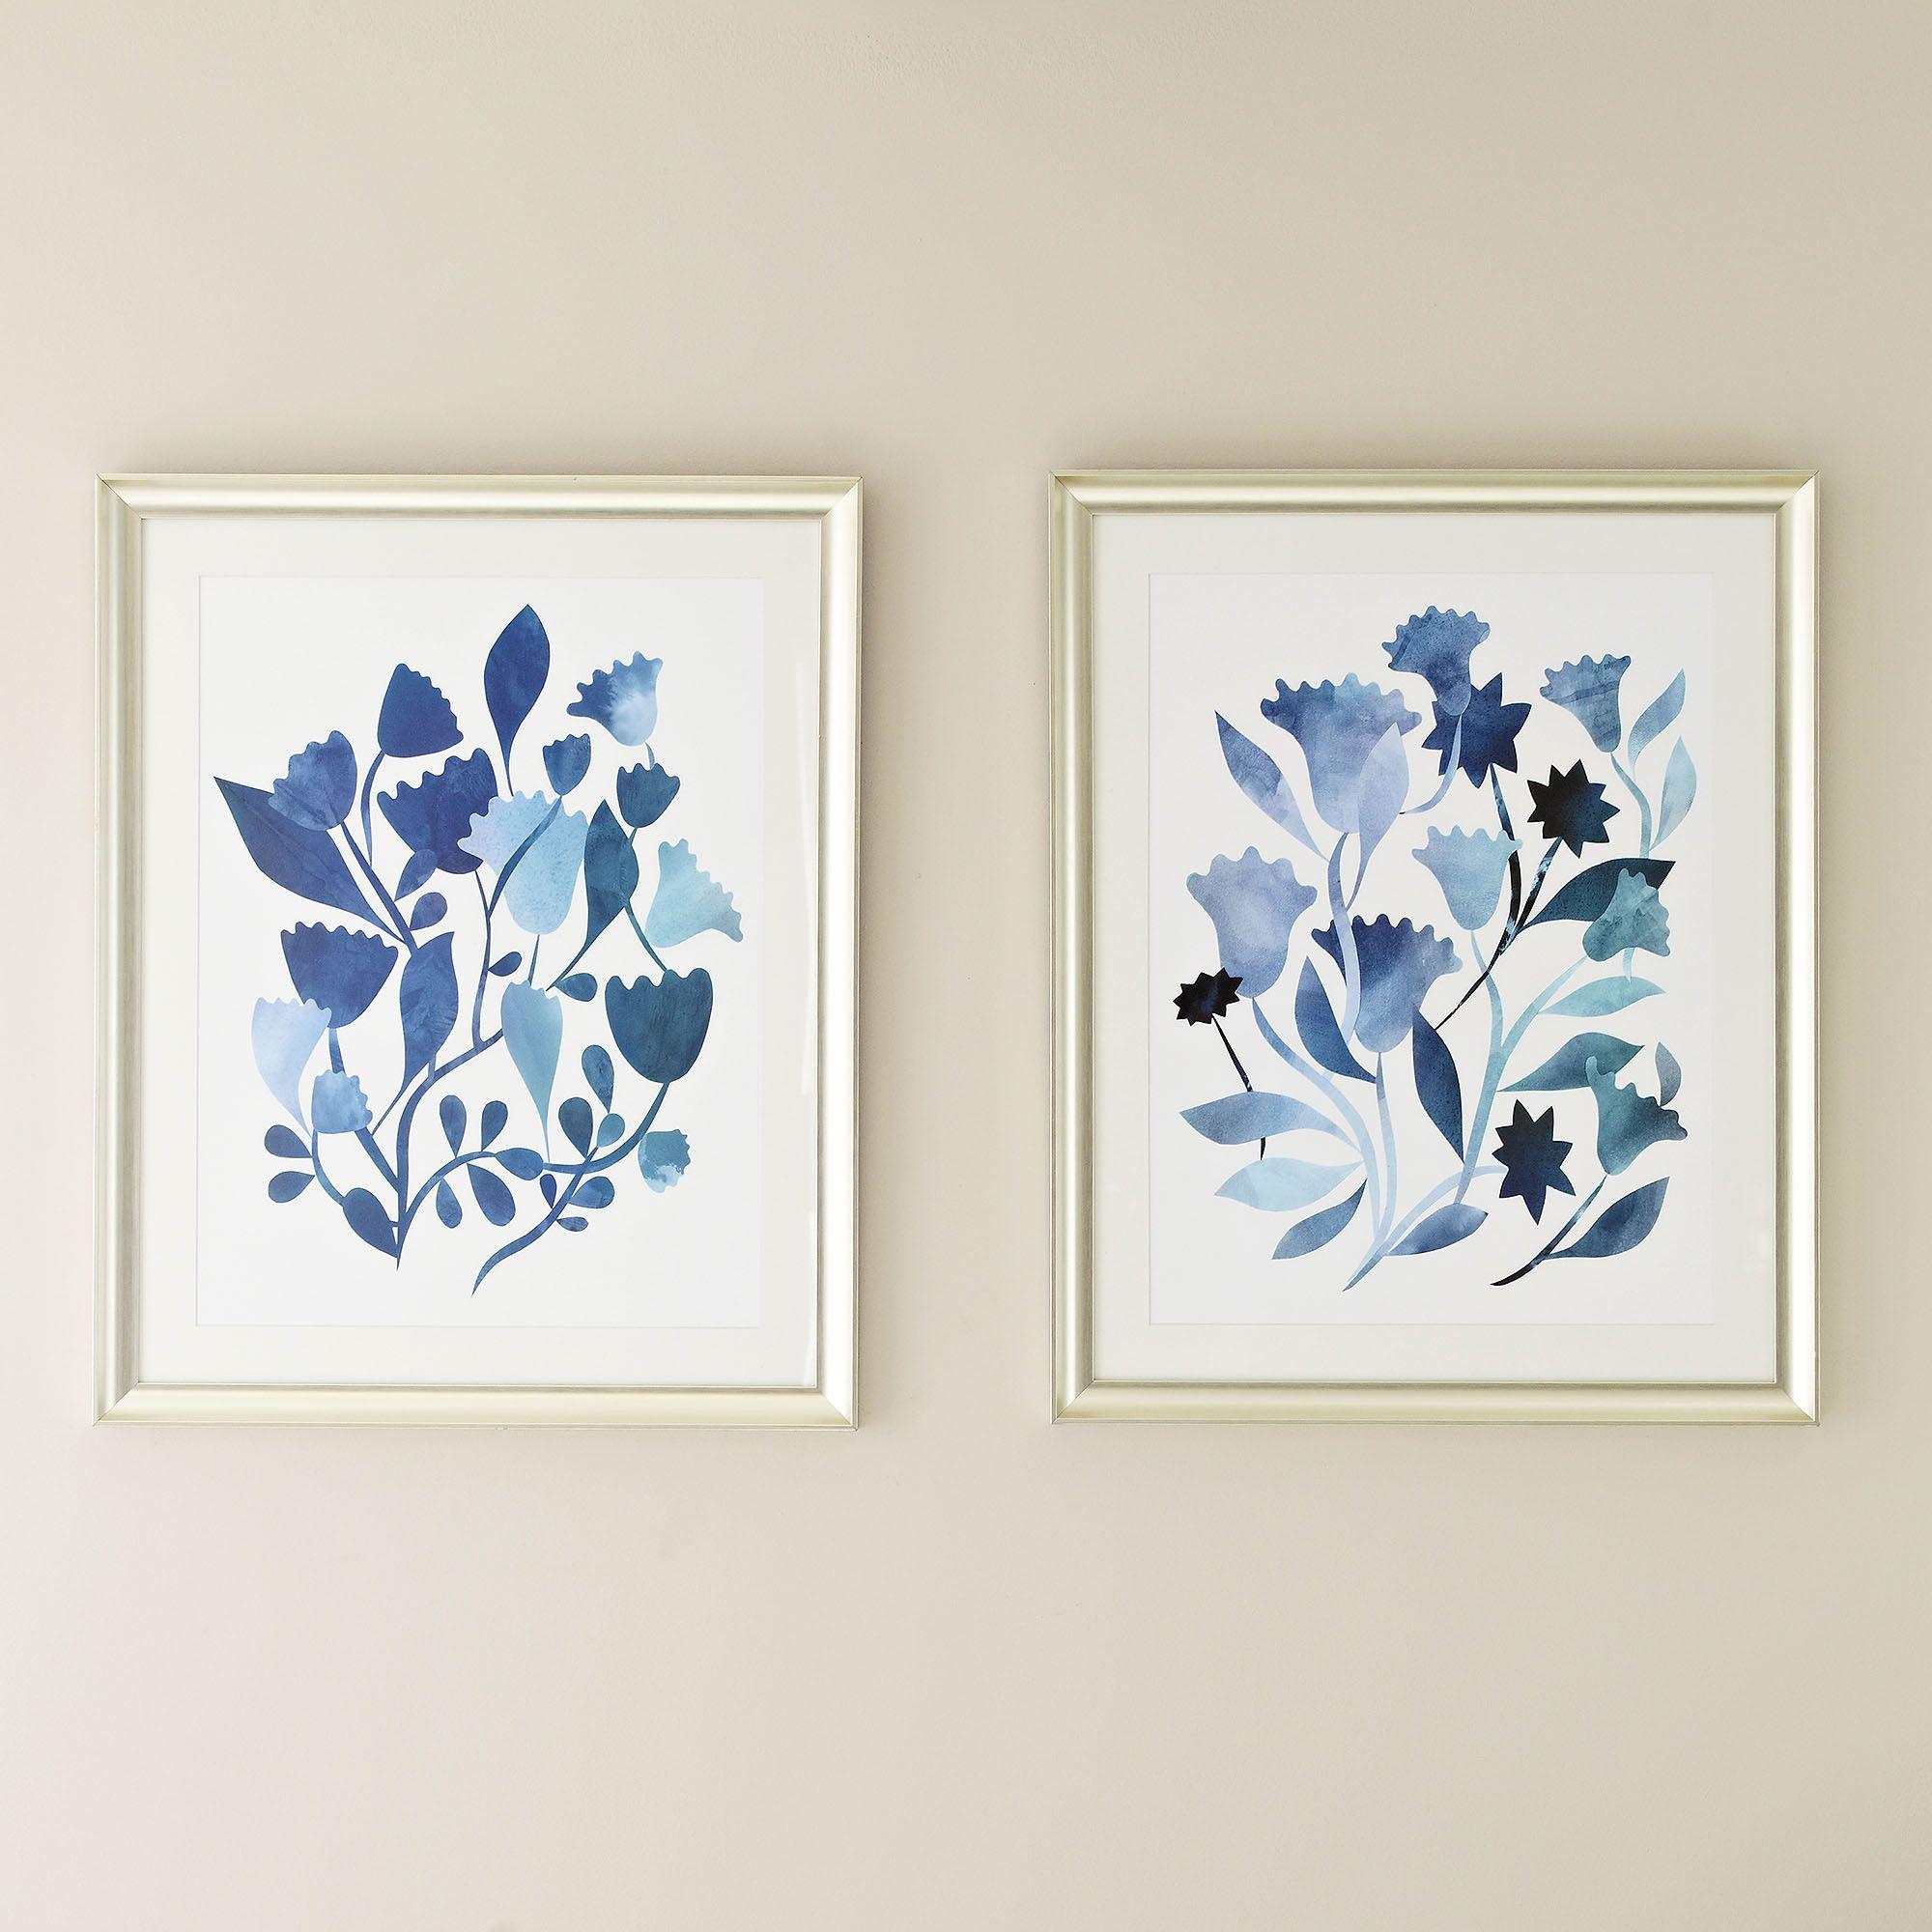 Birch Lane Watercolor Flowers Framed Print Collection | Birch Lane ...